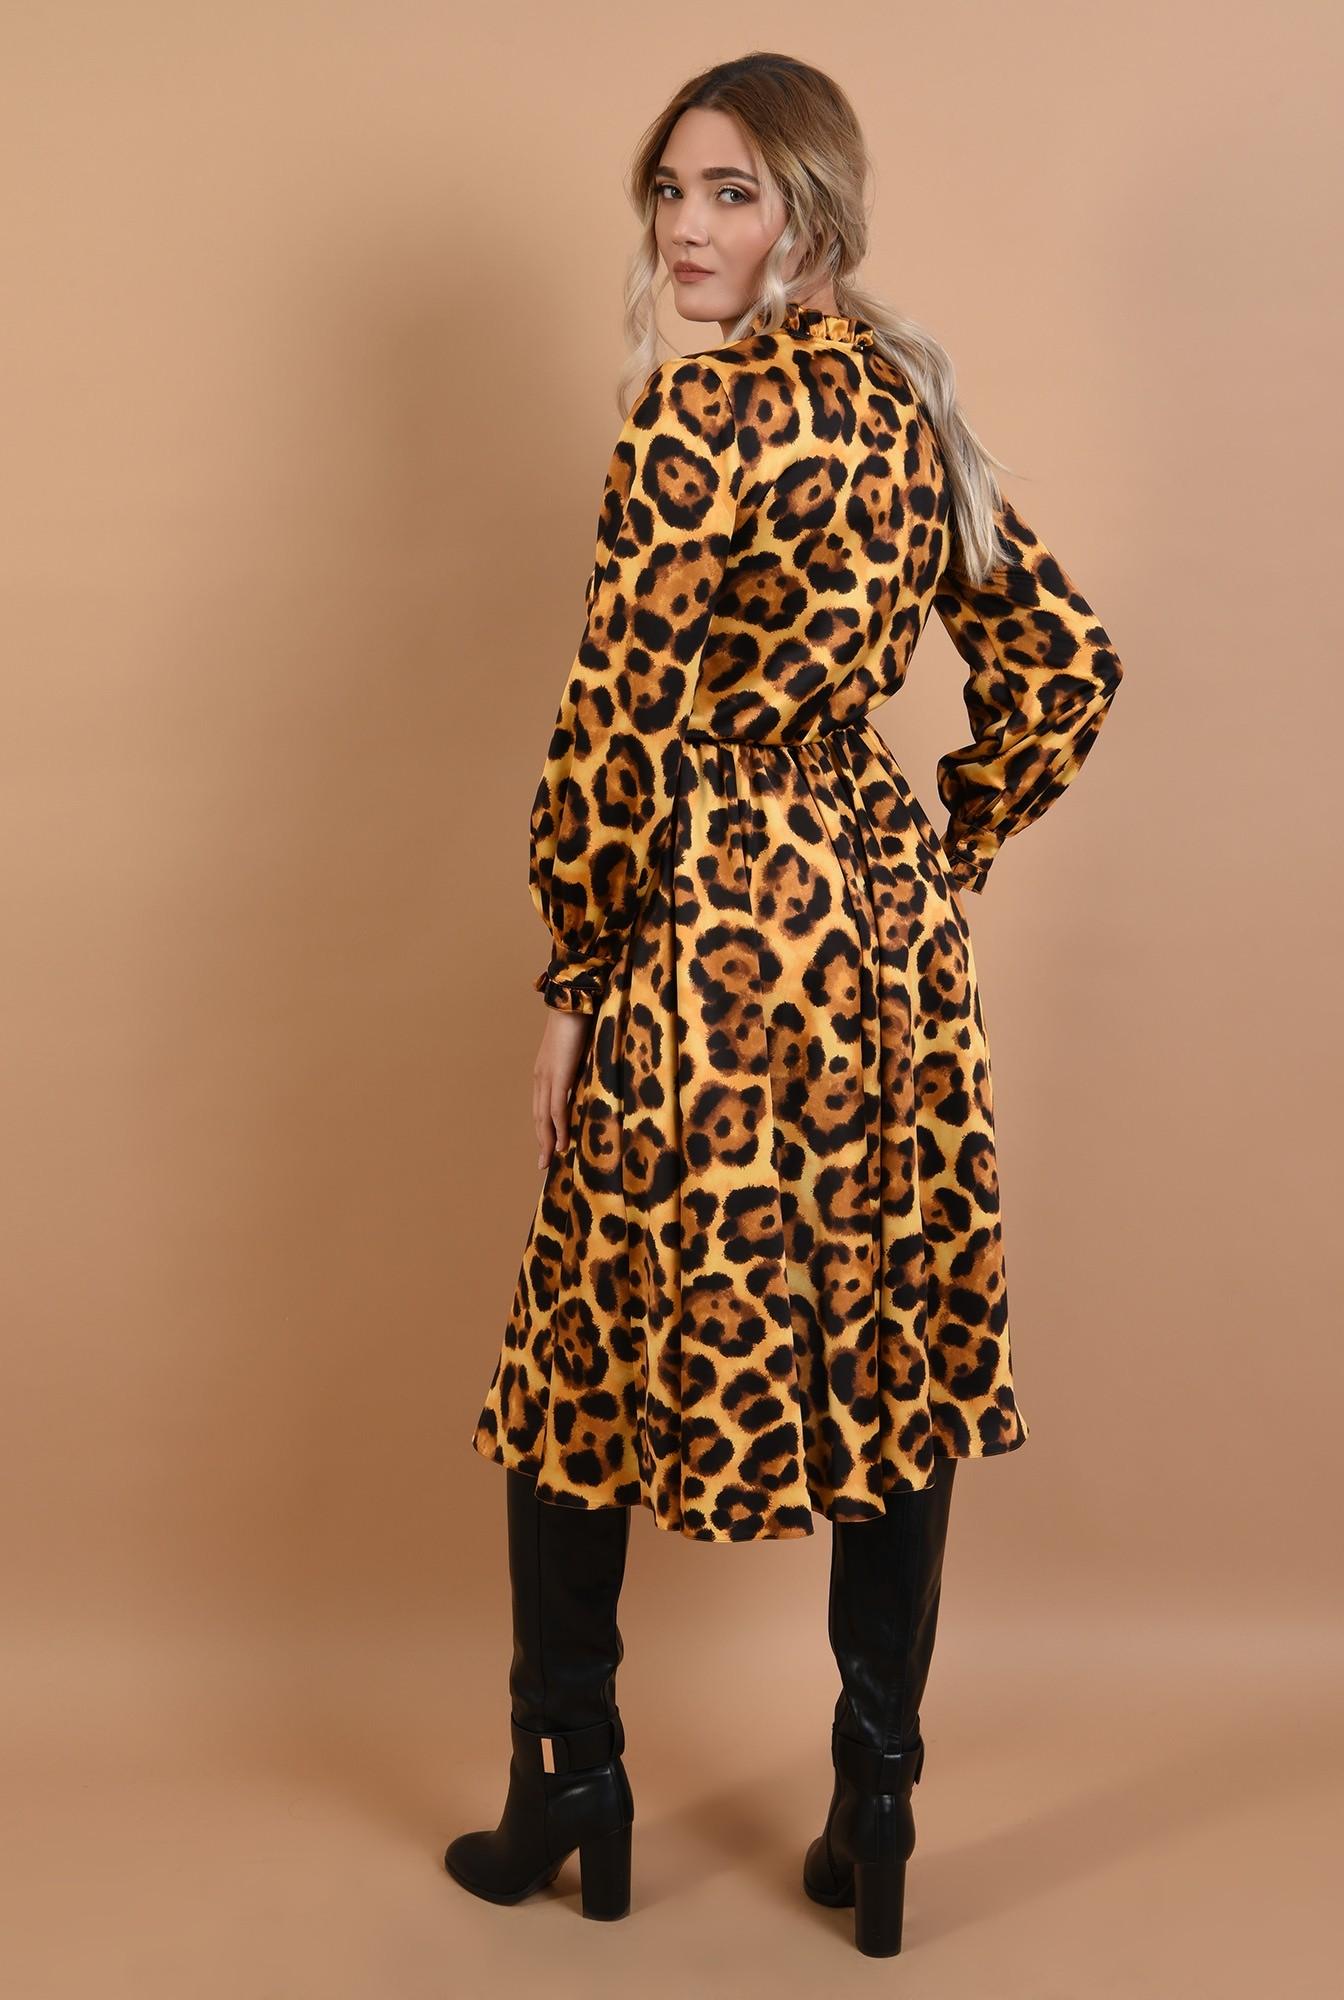 1 - rochie eleganta, din satin animal print, cu nasturi, cu guler, Poema